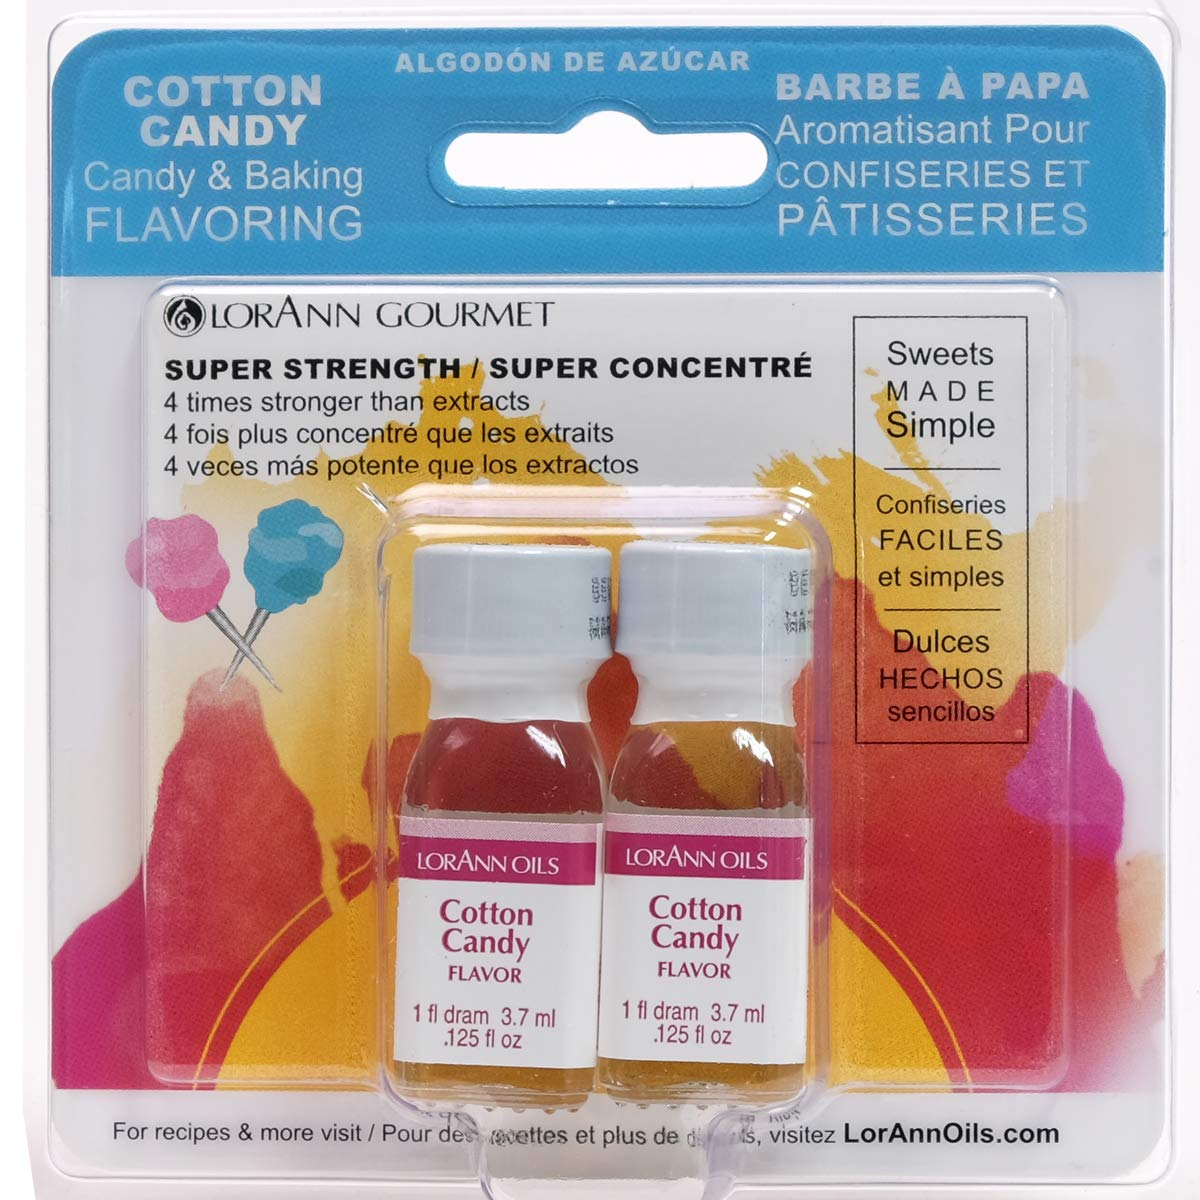 LorAnn Cotton Candy Super Strength Flavor, 1 dram bottle (.0125 fl oz - 3.7ml)